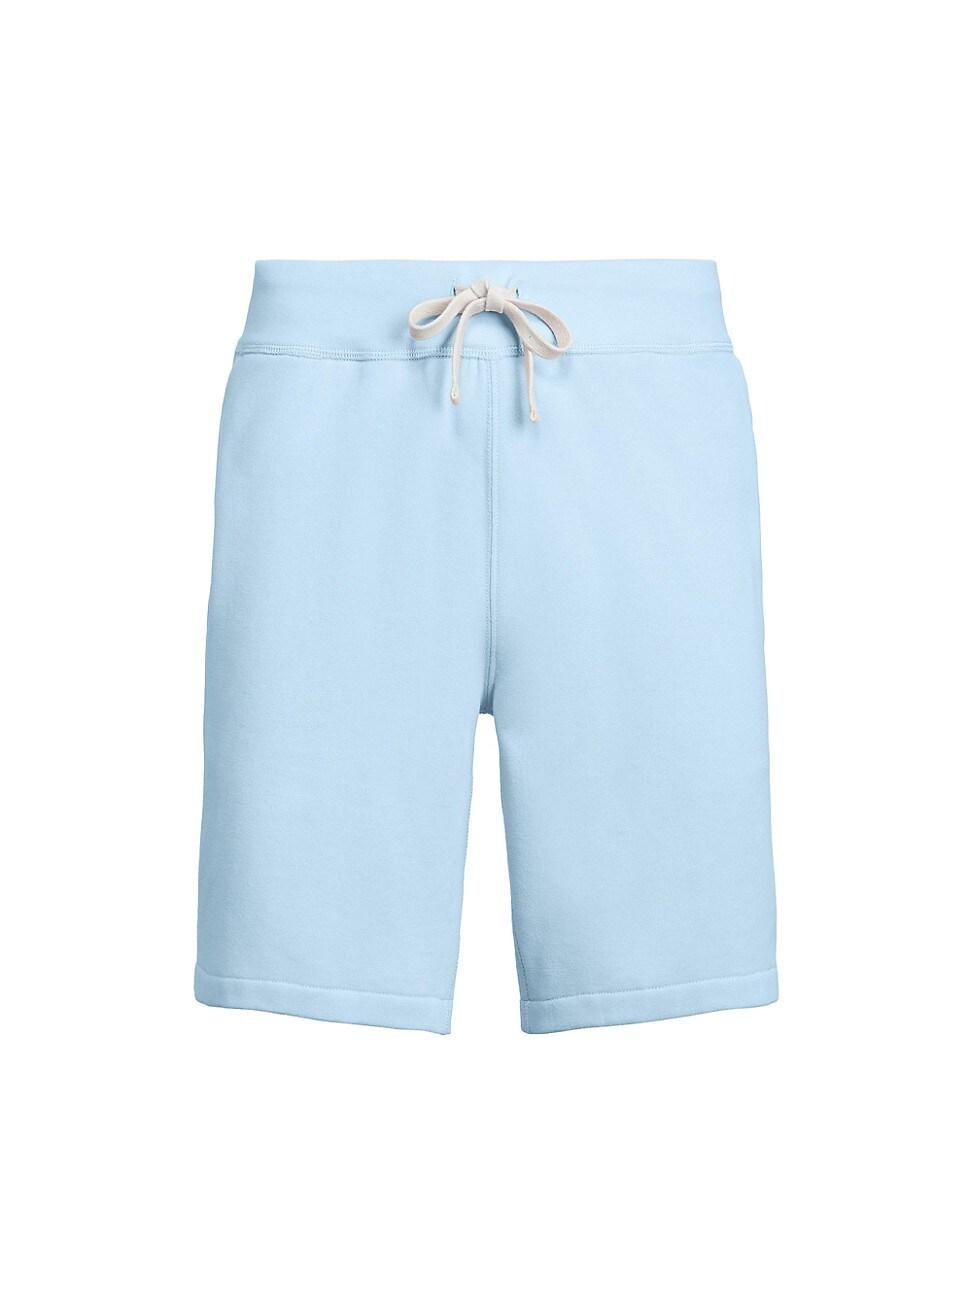 "Polo Ralph Lauren Men's 9.5"" Cotton-blend-fleece Shorts In Elite Blue"